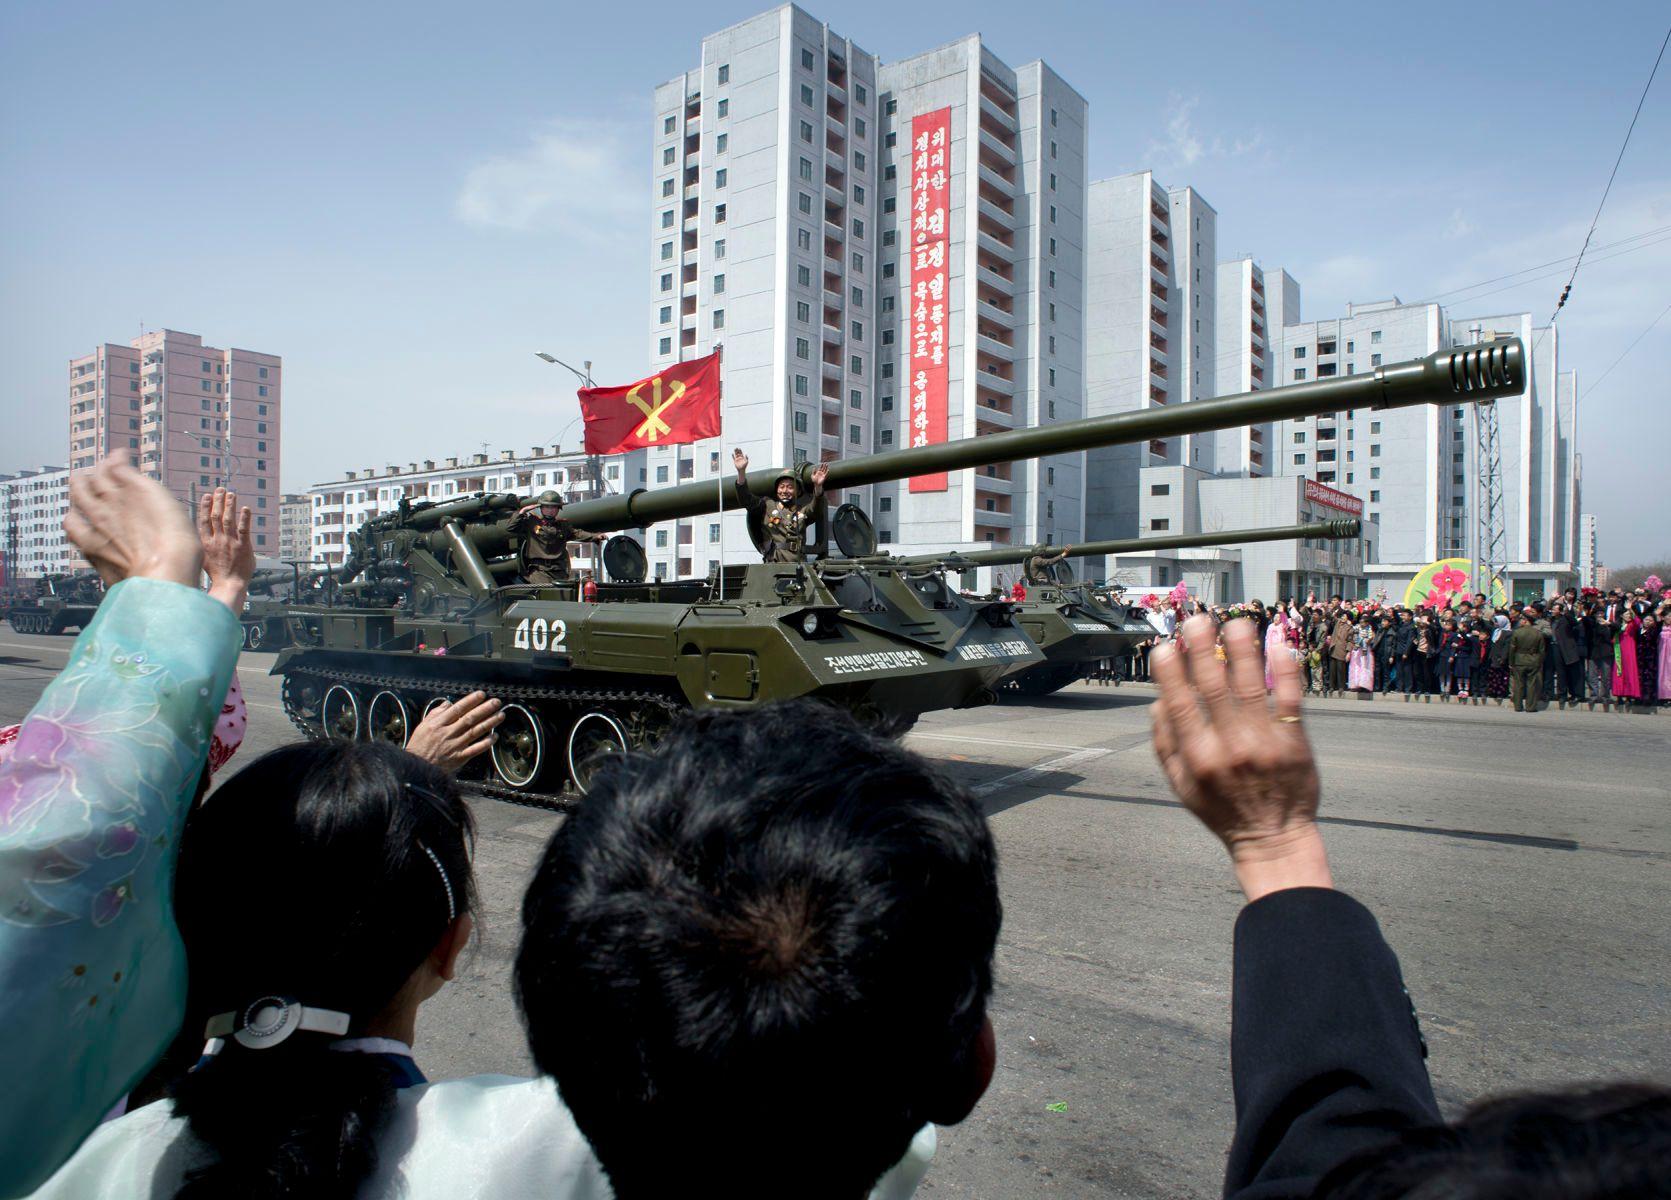 1dprk_pyongyang_2_0113_2.jpg